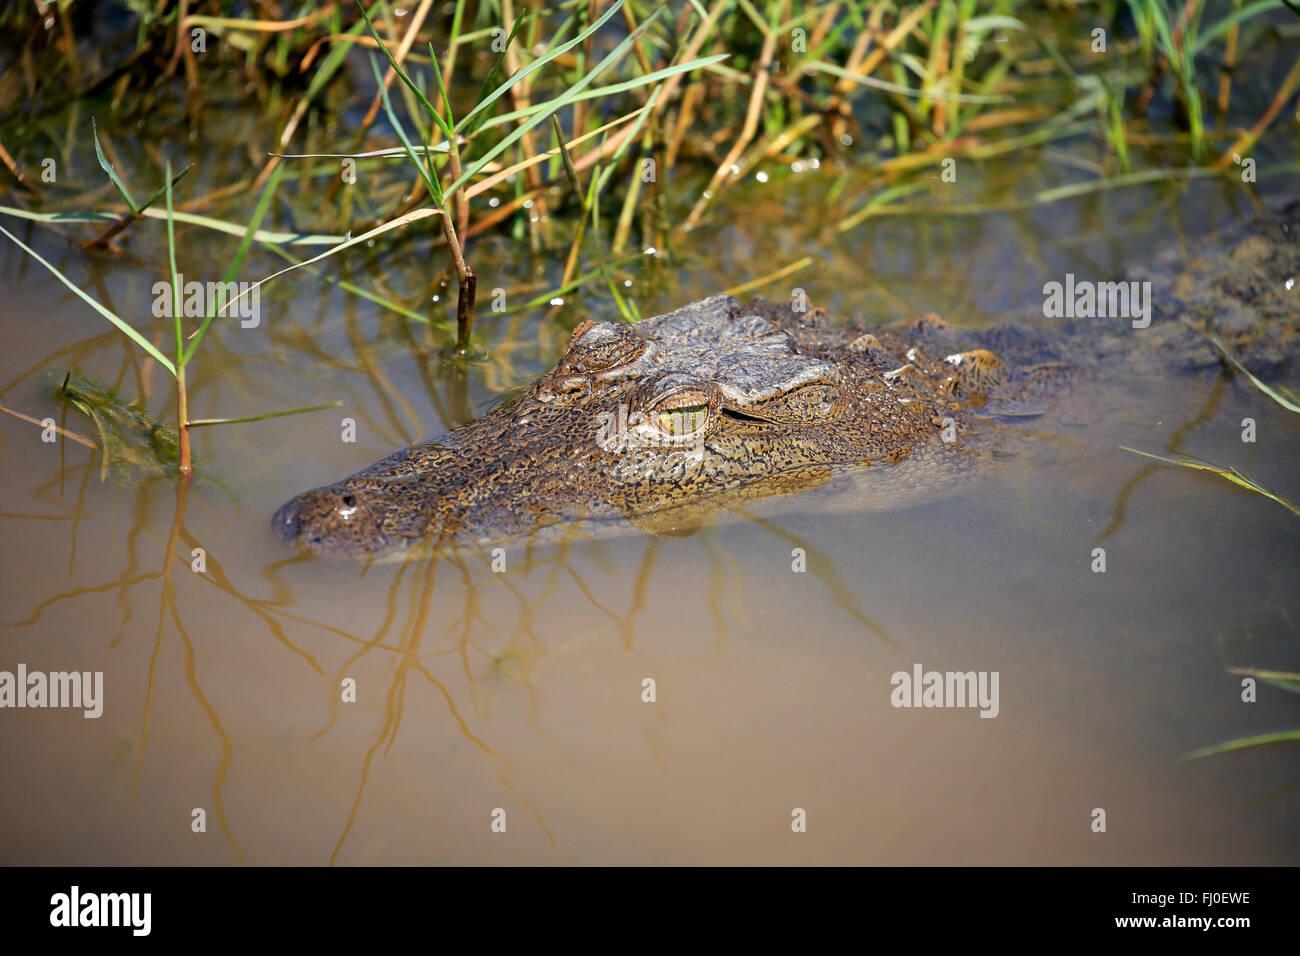 Saltwater Crocodile, Bundala Nationalpark, Sri Lanka, Asia / (Crocodylus porosus) - Stock Image